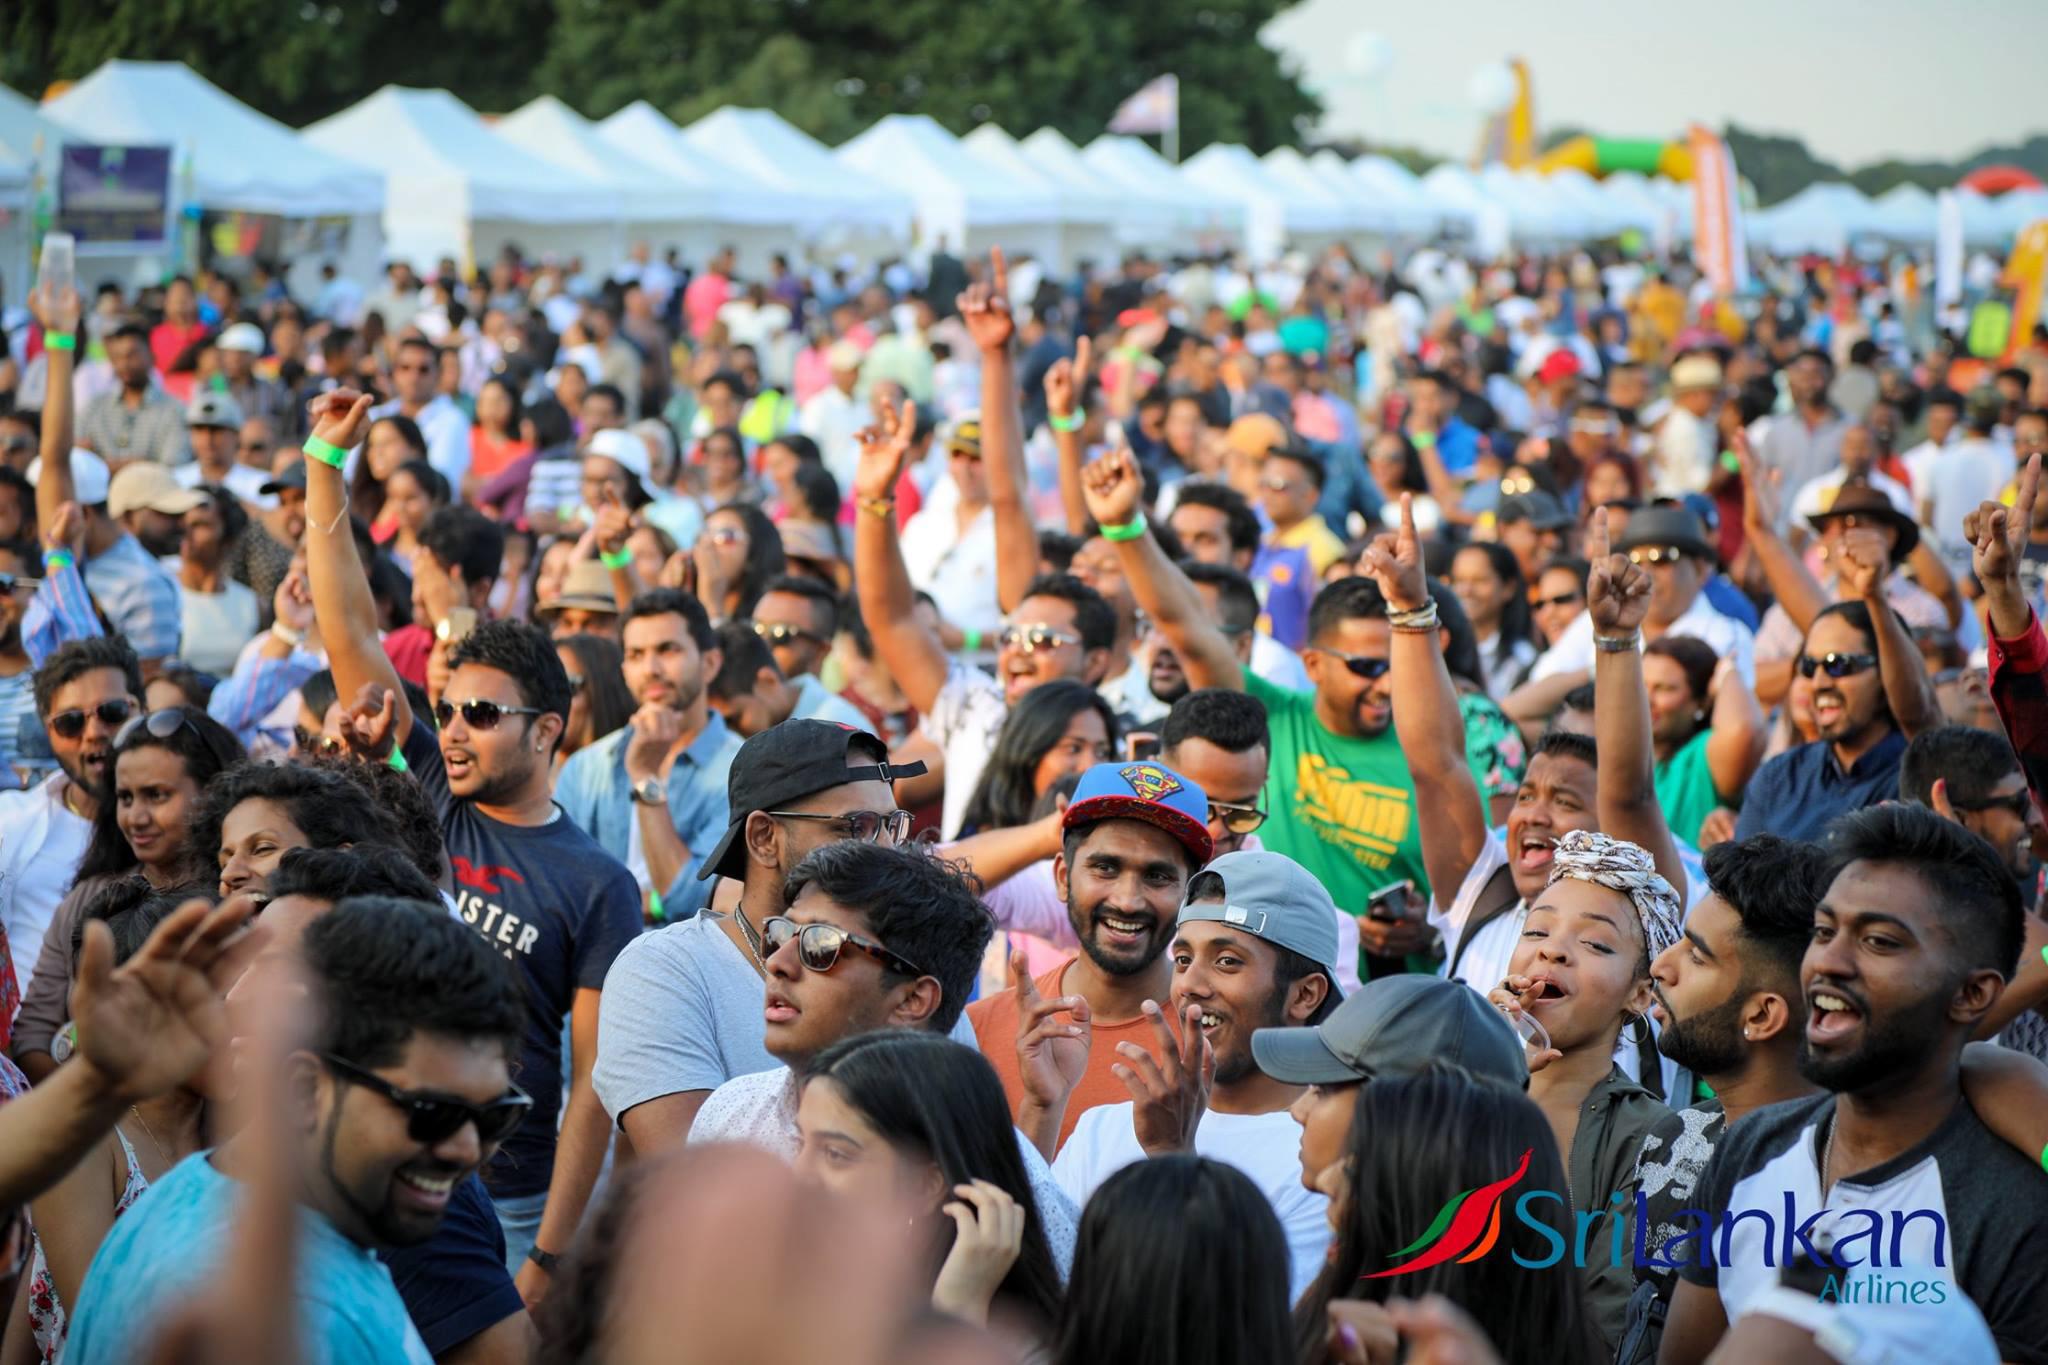 Sri-Lankan-airlines-cricket-festival-london-2017-natalia-smith--photography-16.jpg